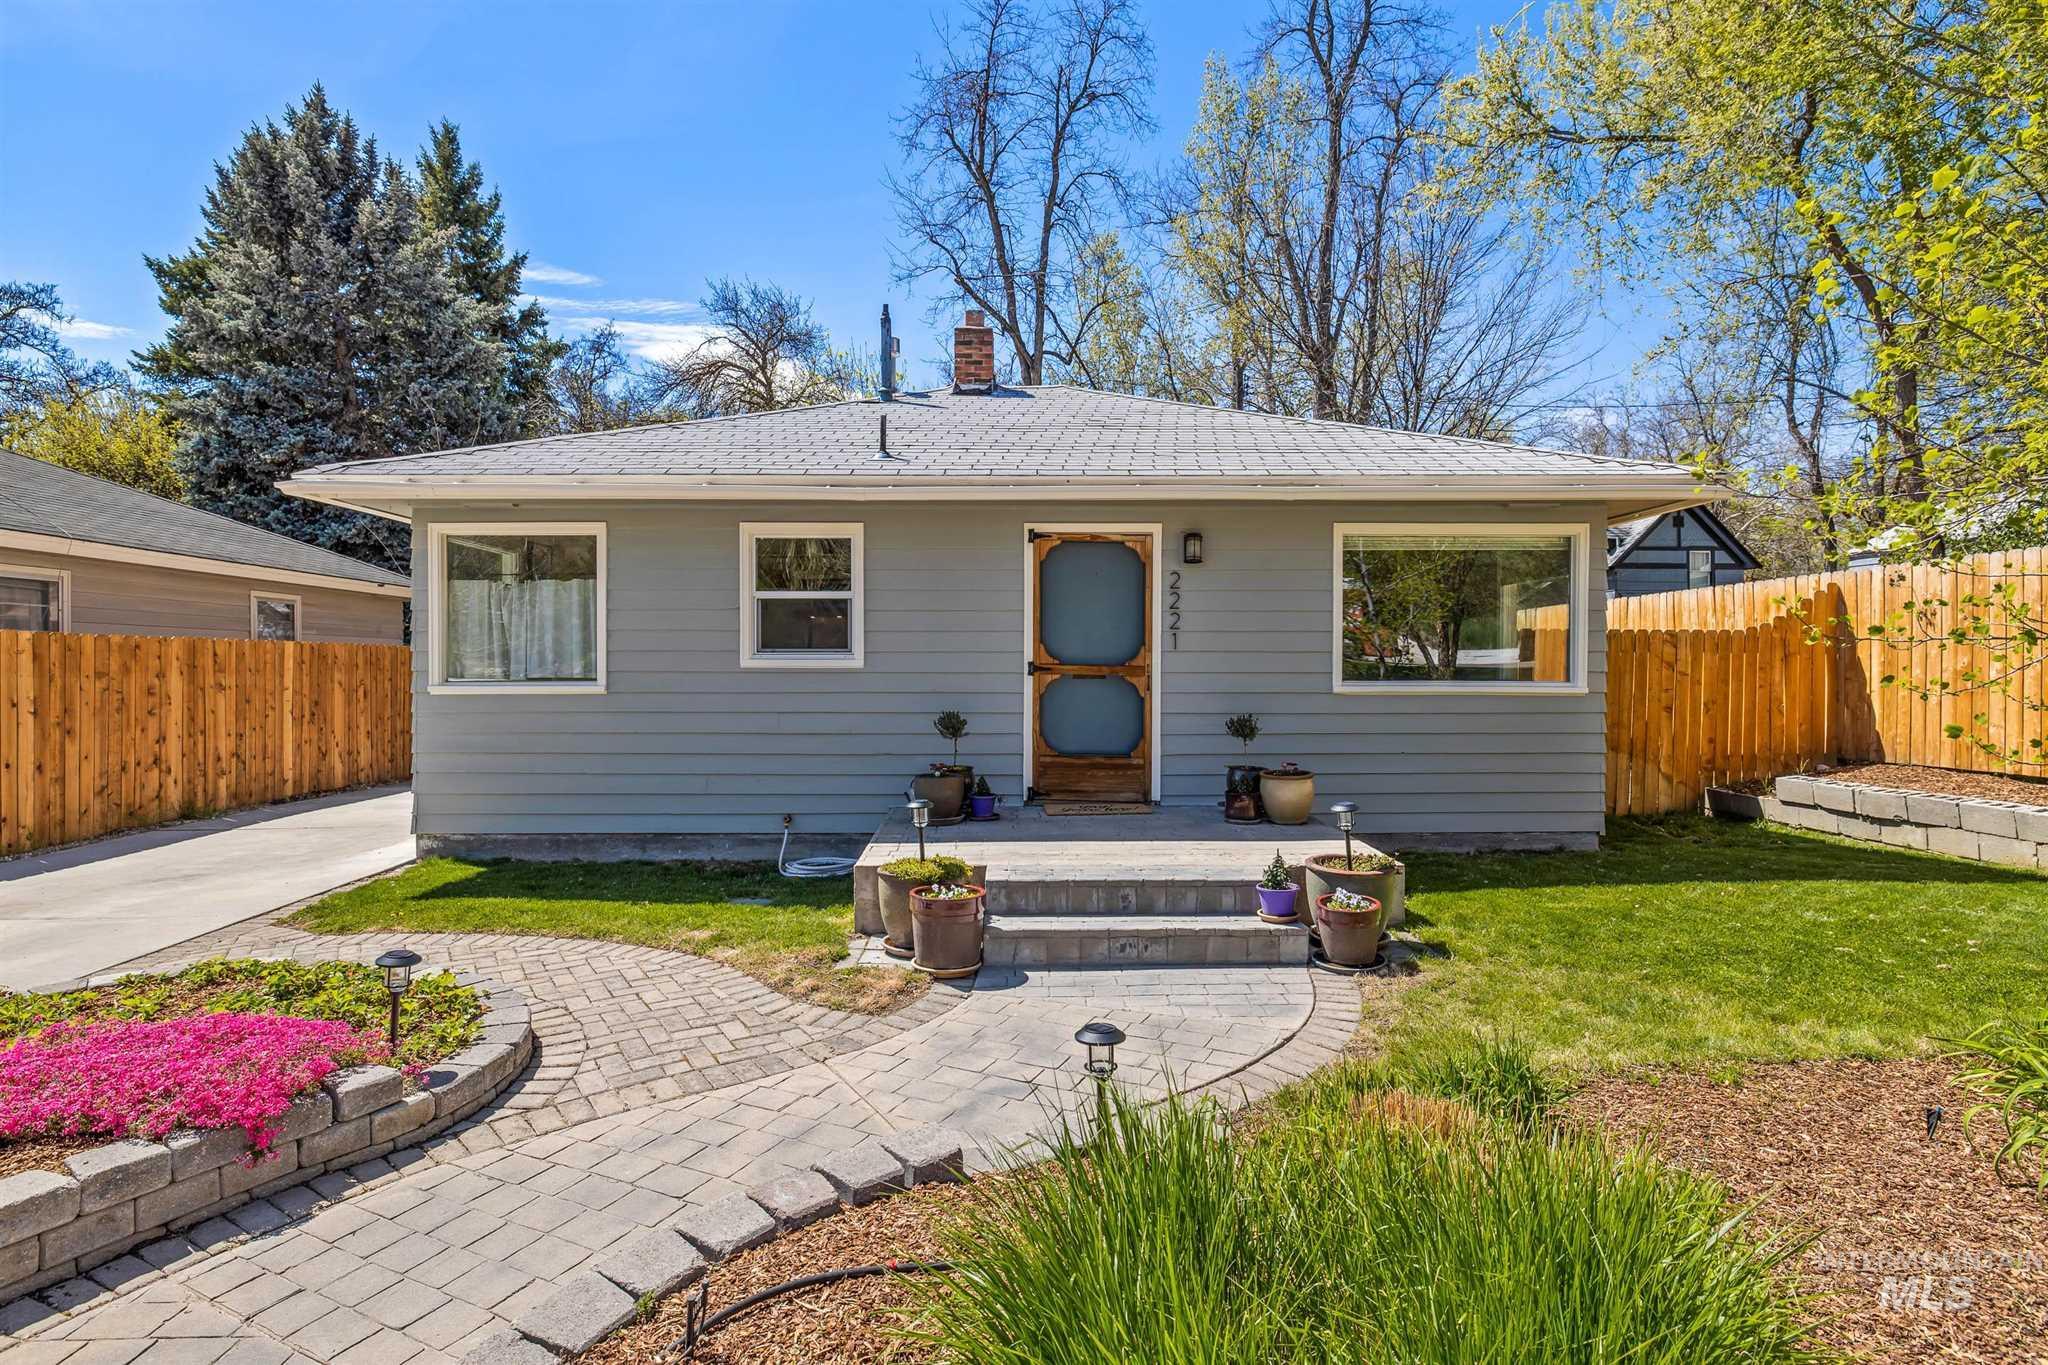 2221 N 15th Street Property Photo - Boise, ID real estate listing